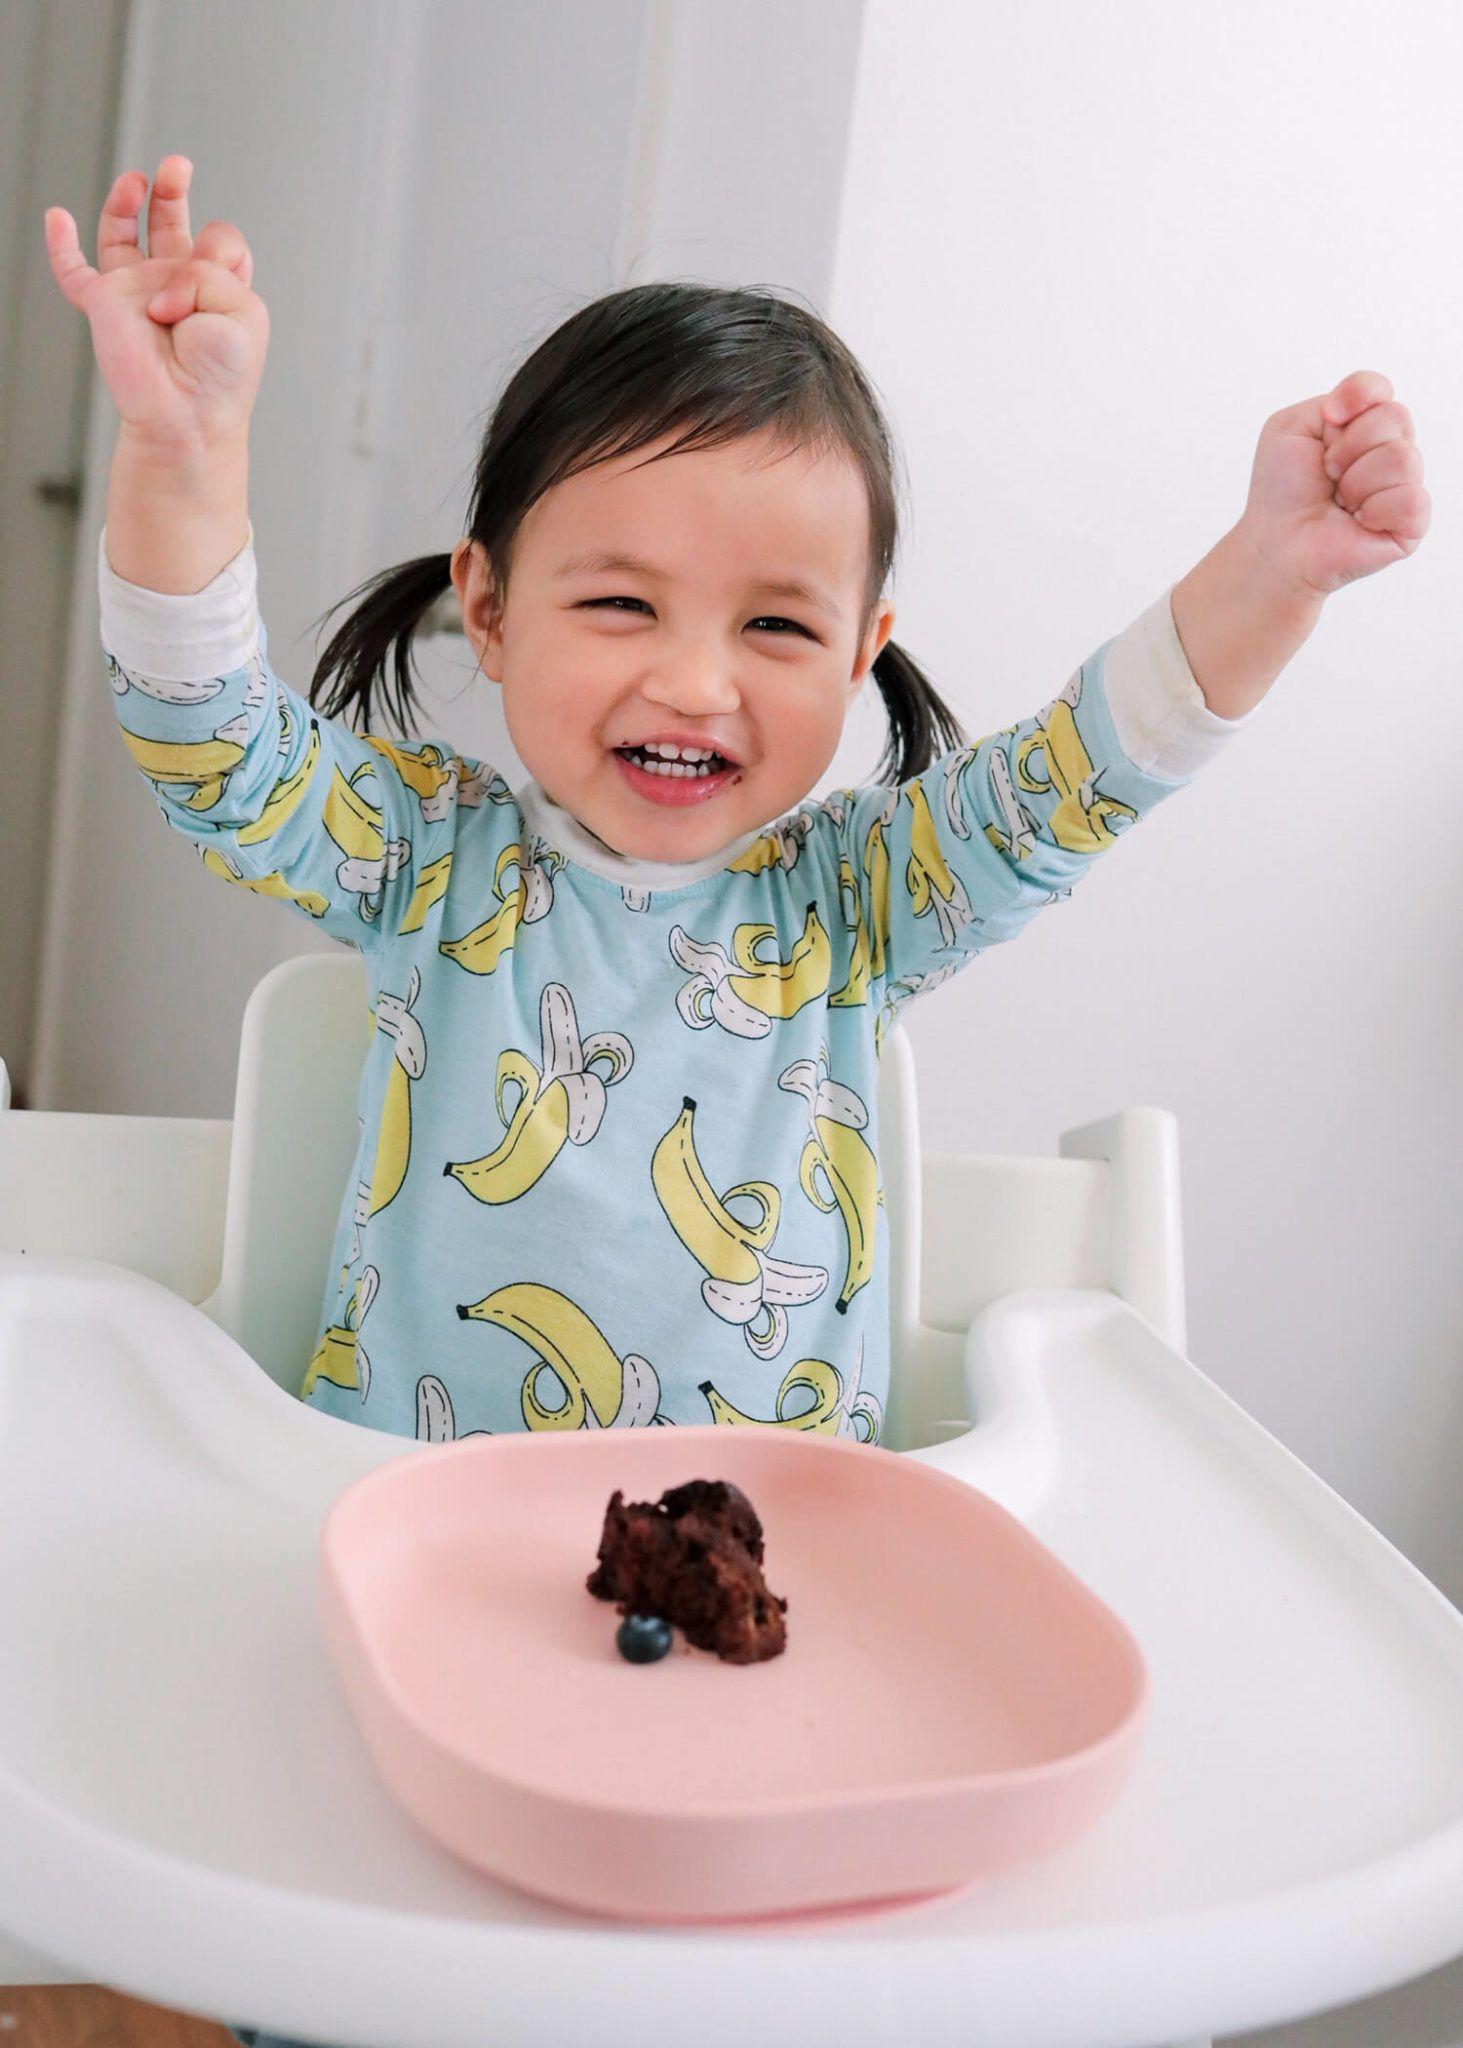 Moist Zucchini Chocolate Cake Recipe Can Be Dairy Egg Free Vegan Recipe In 2020 Chocolate Zucchini Cake Recipe Chocolate Zucchini Cake Cake Recipes